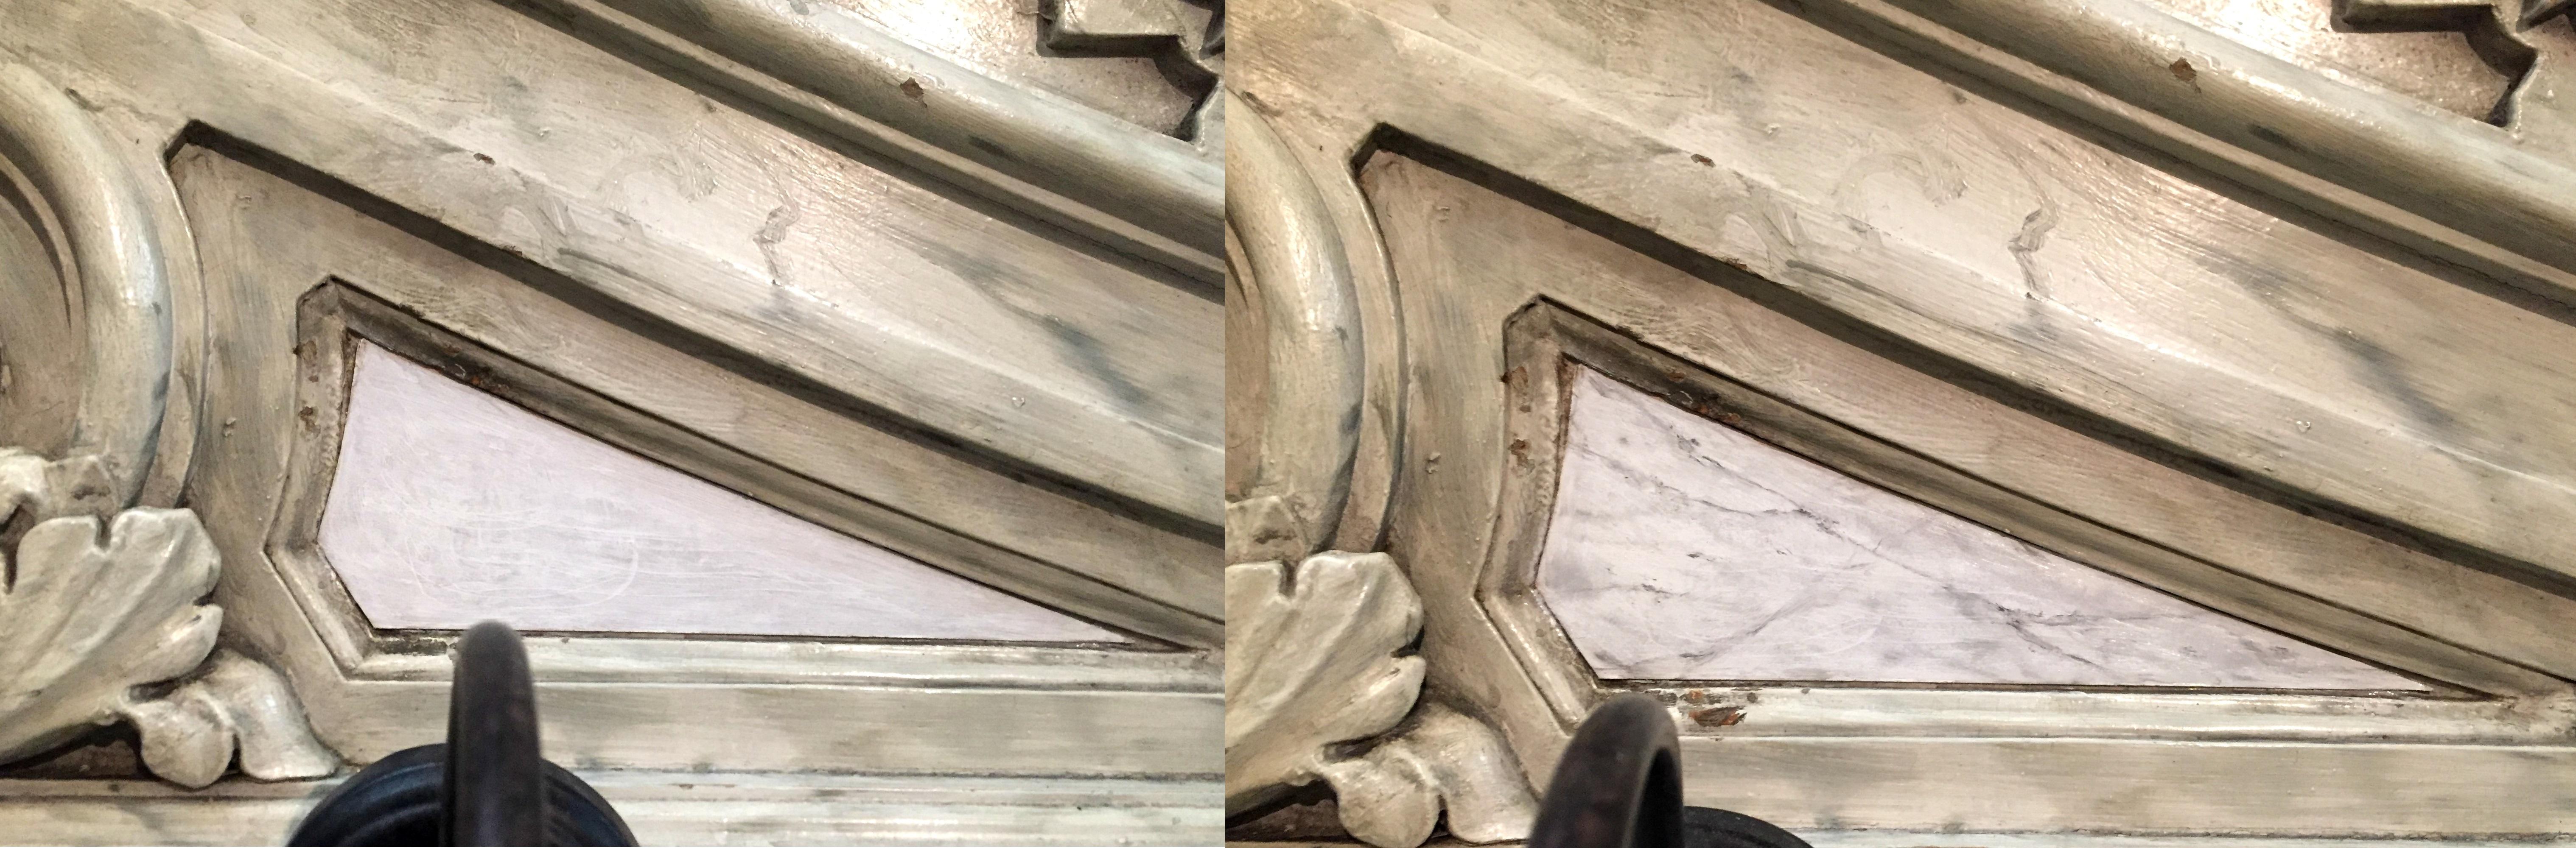 Imitation de marbre blanc veiné